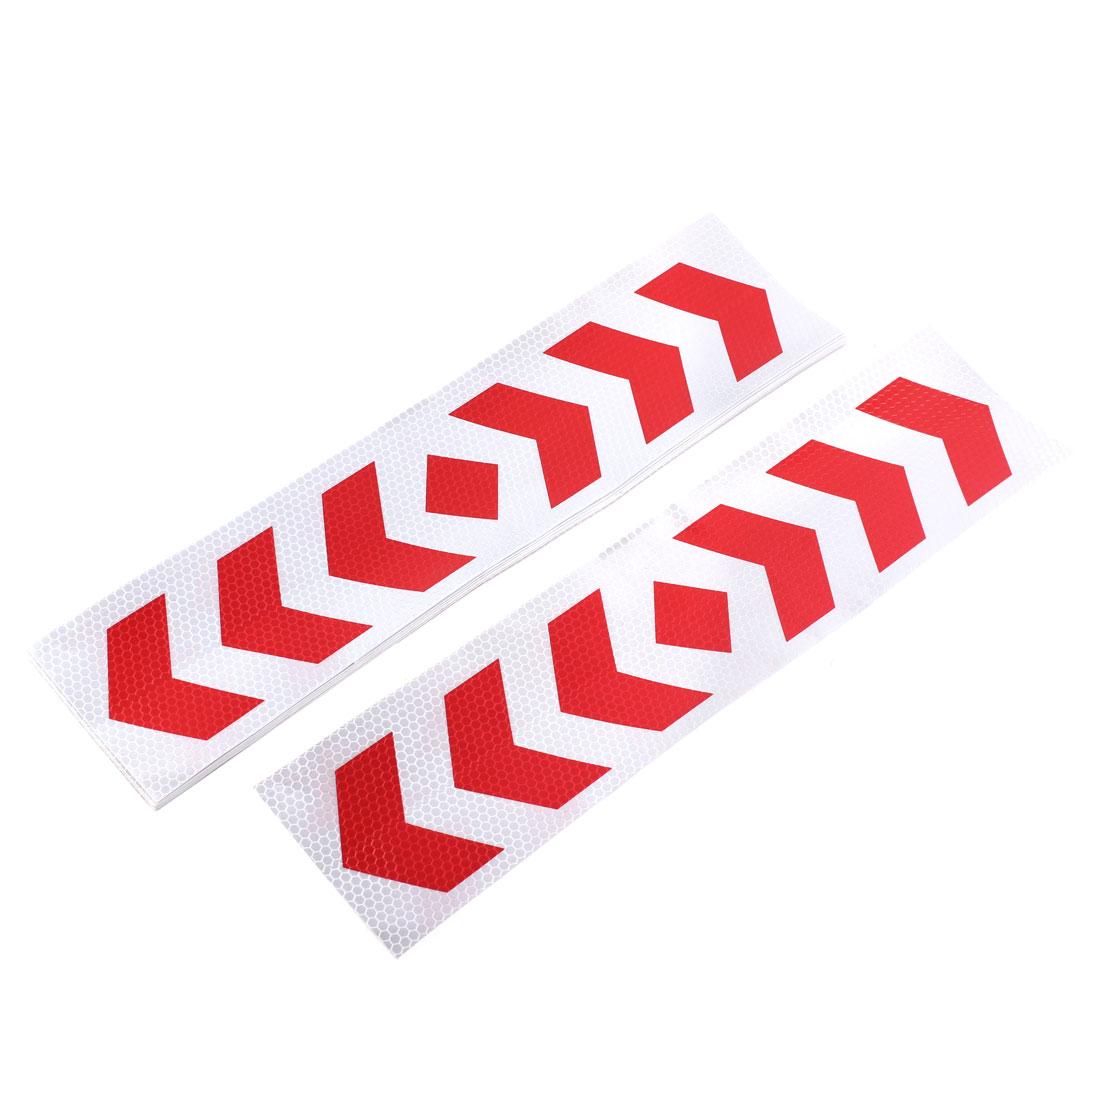 40cm x 10cm Red Sliver Tone Plastic Car Reflective Decal Stickers 10pcs